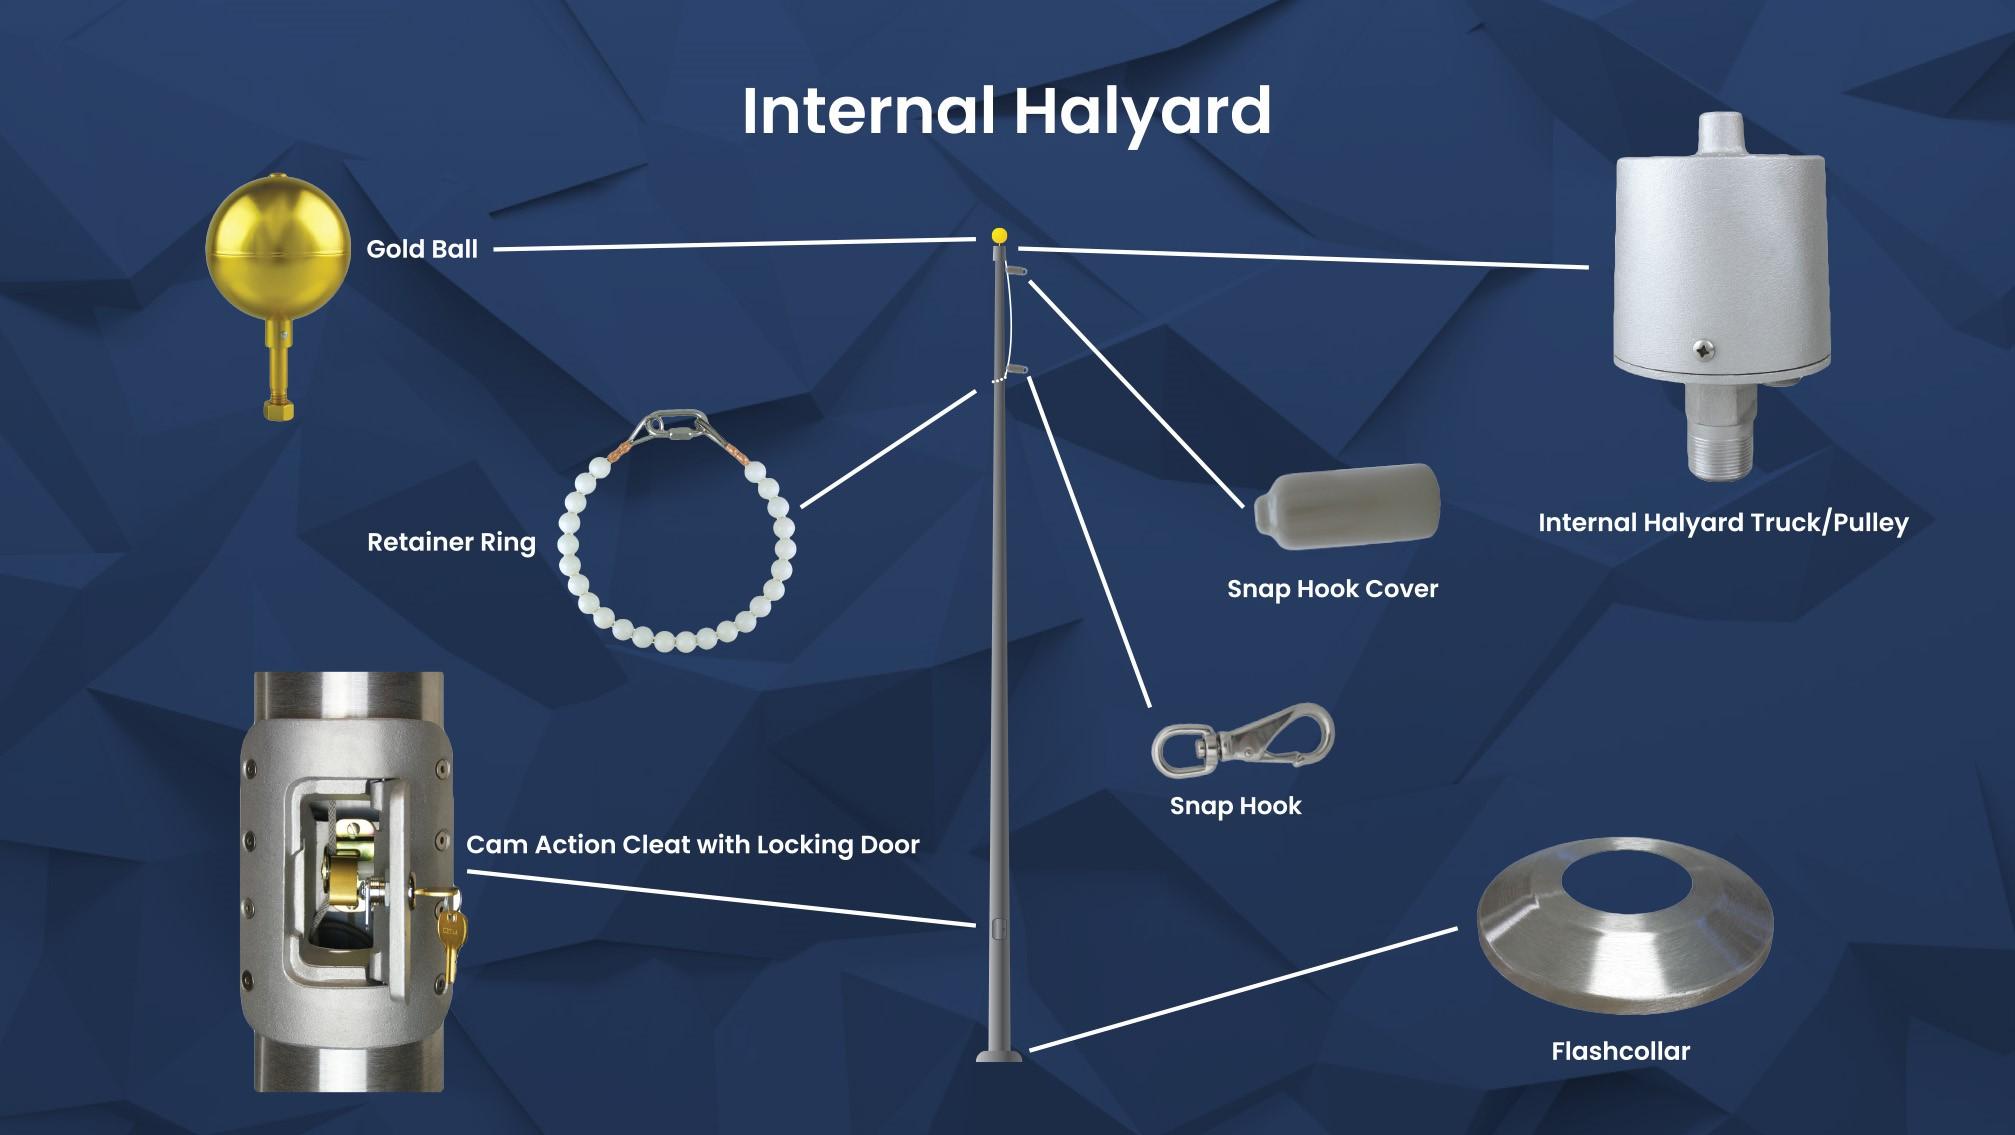 Internal Halyard